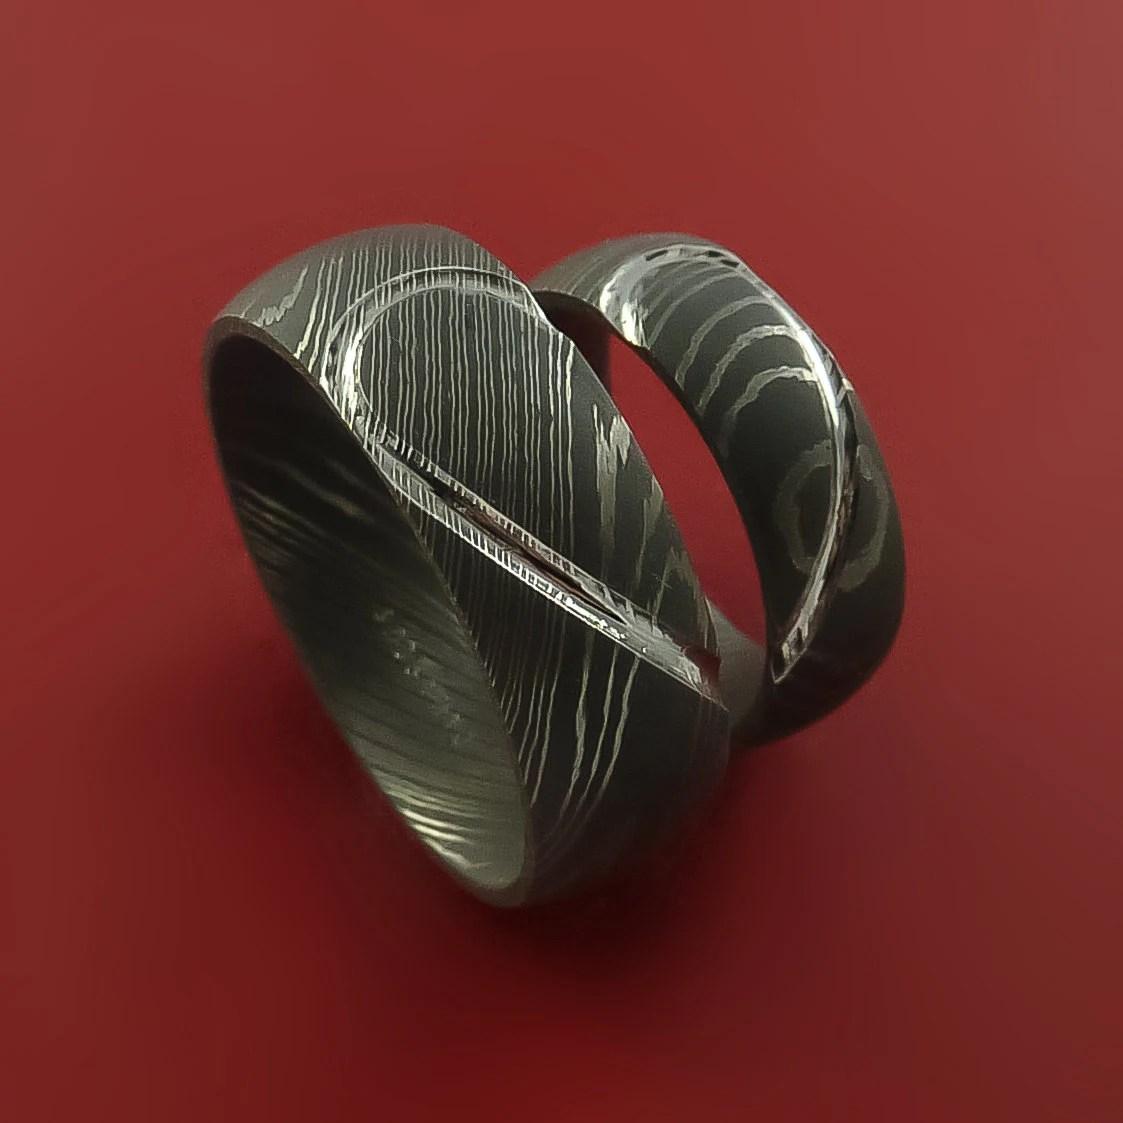 matching damascus steel heart carved damascus steel wedding bands Matching Damascus Steel Heart Carved Ring Set Wedding Bands Genuine Craftsmanship zoom